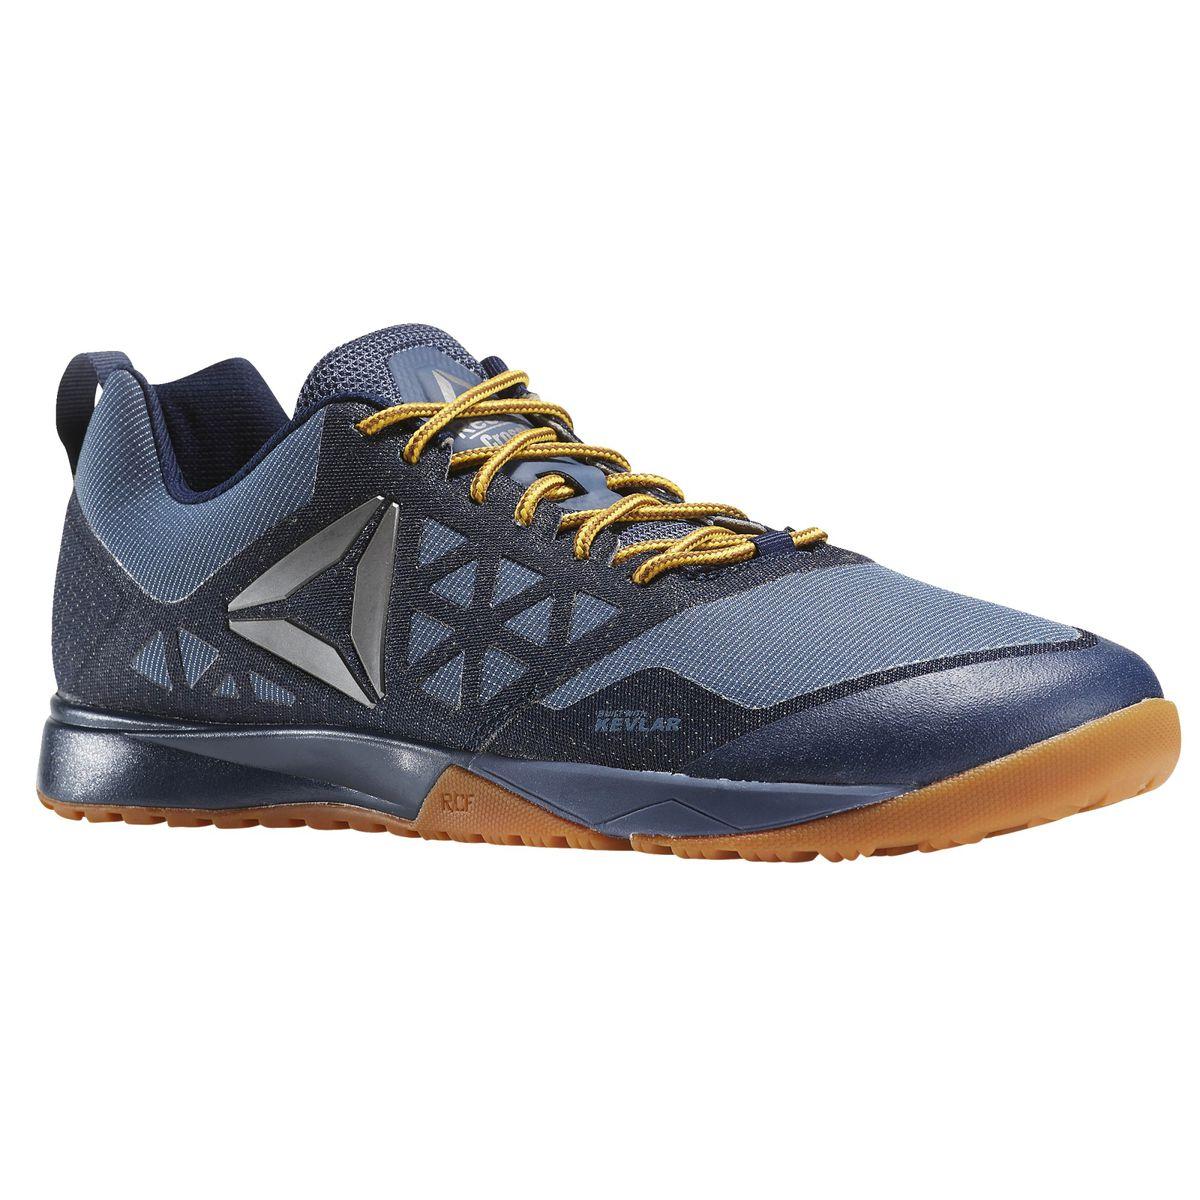 Men's Reebok Crossfit Nano 6.0 Denim Training Shoes